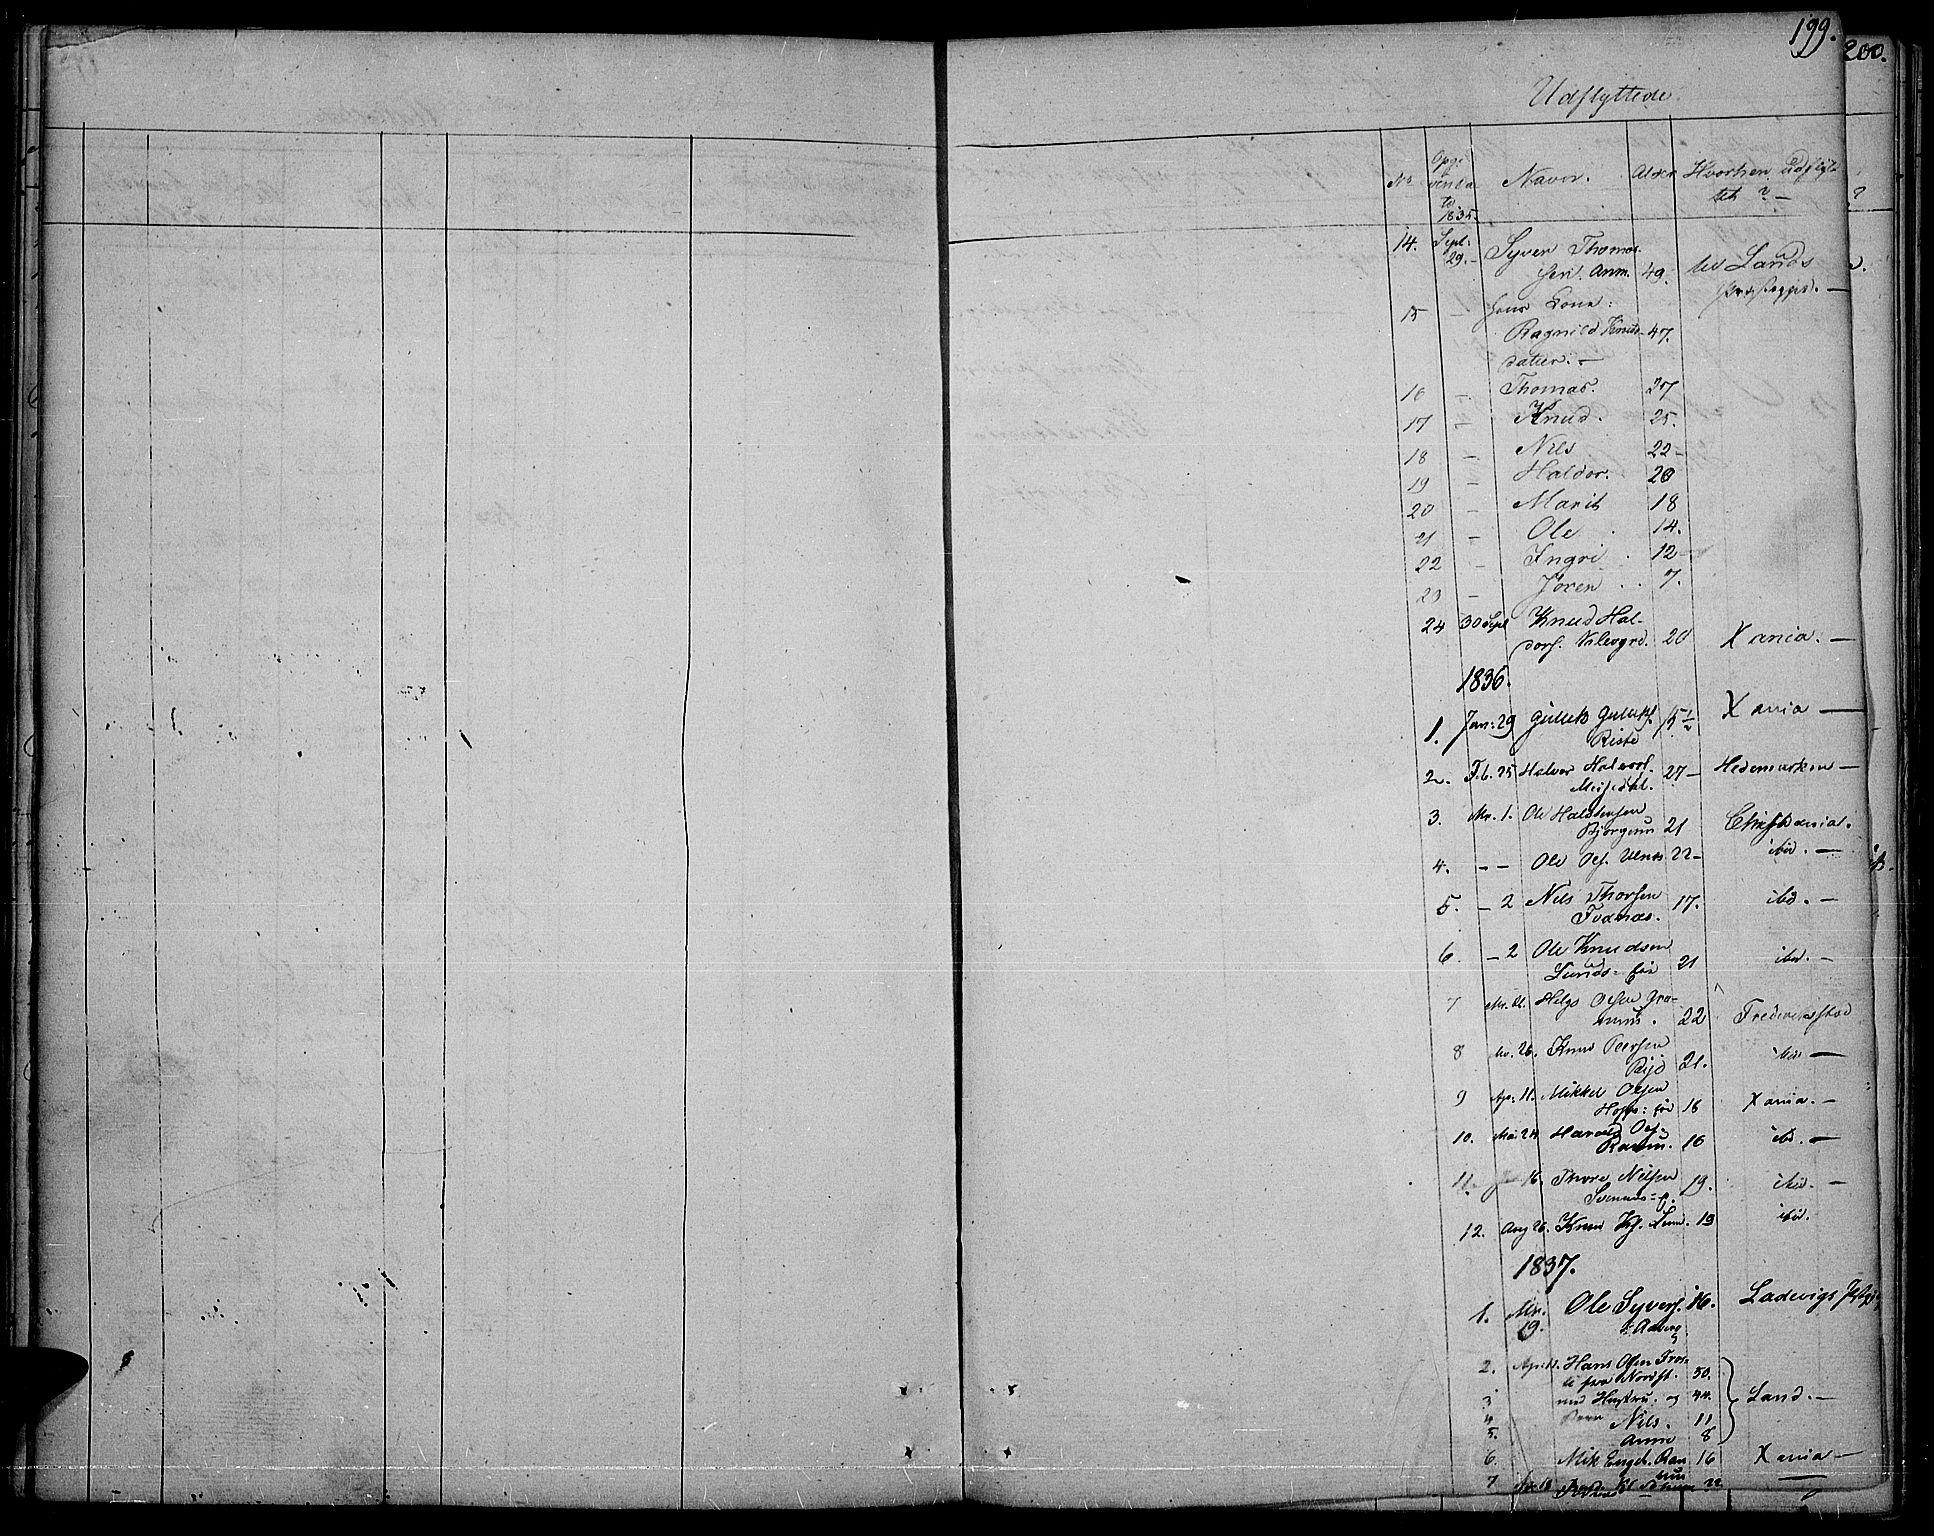 SAH, Nord-Aurdal prestekontor, Ministerialbok nr. 3, 1828-1841, s. 199